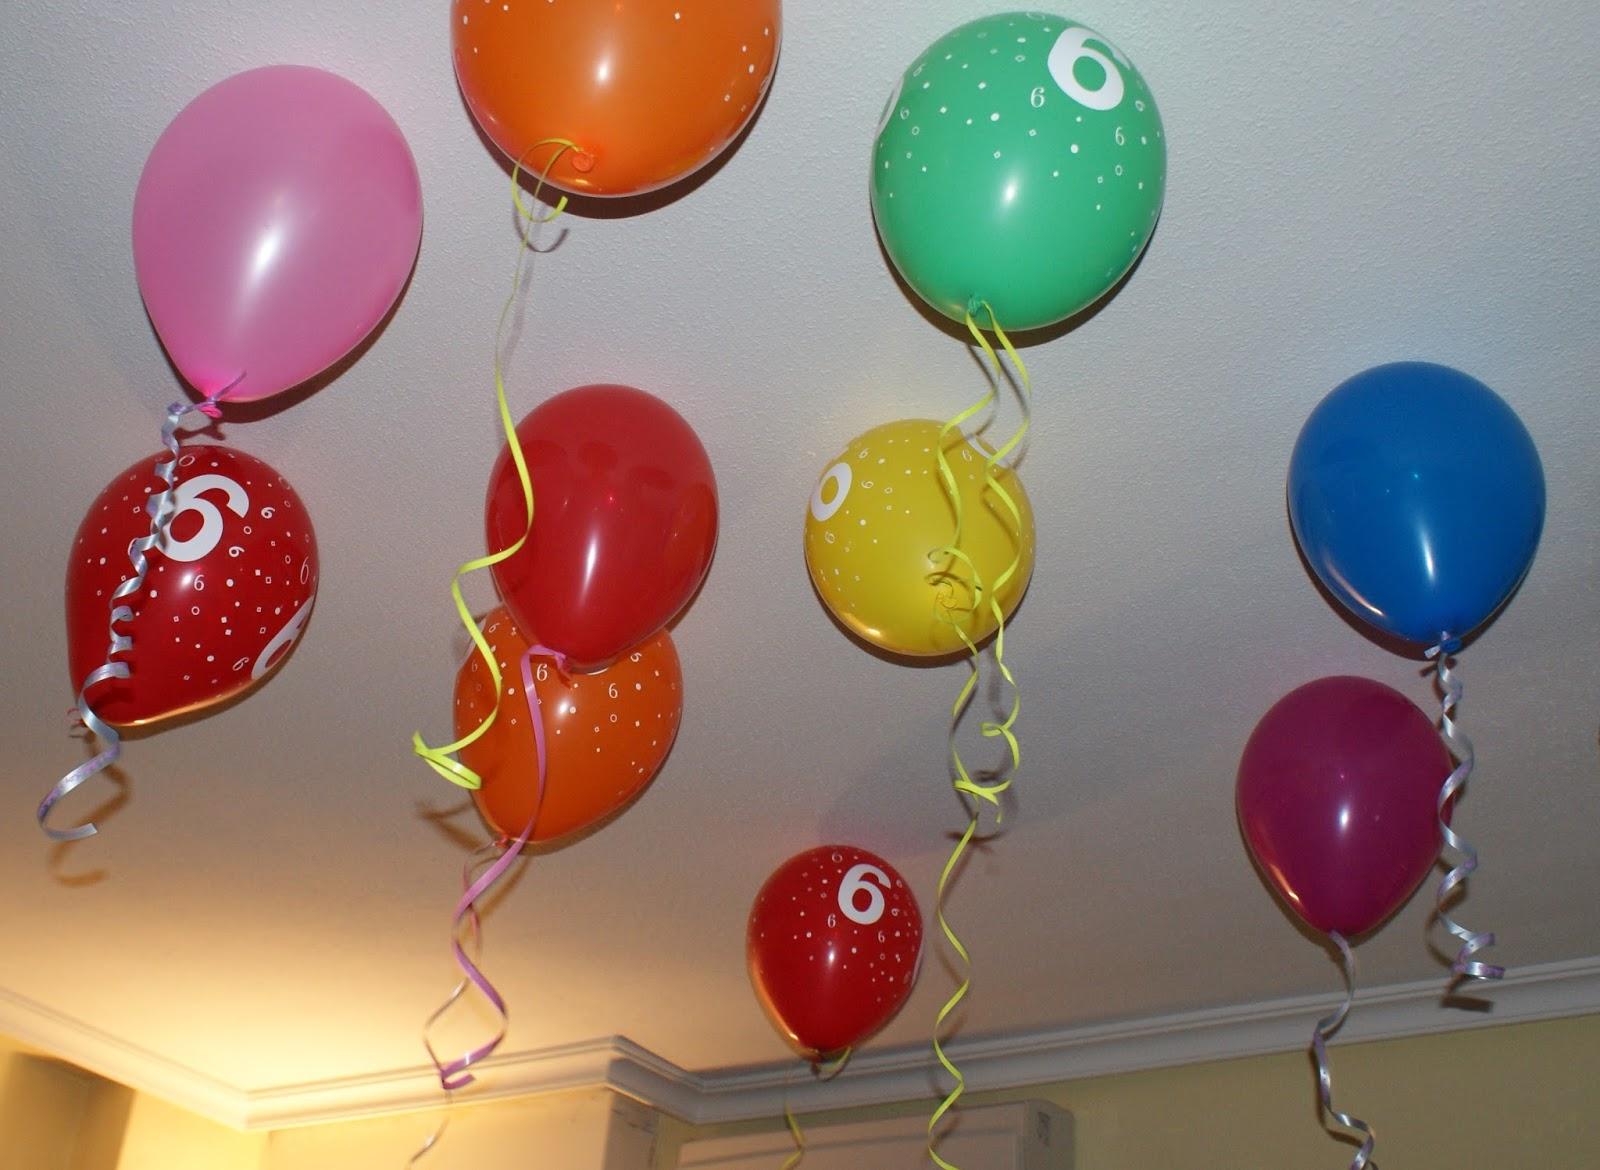 Como decorar globos globos de papel para decorar fiestas - Decoracion con globos ...